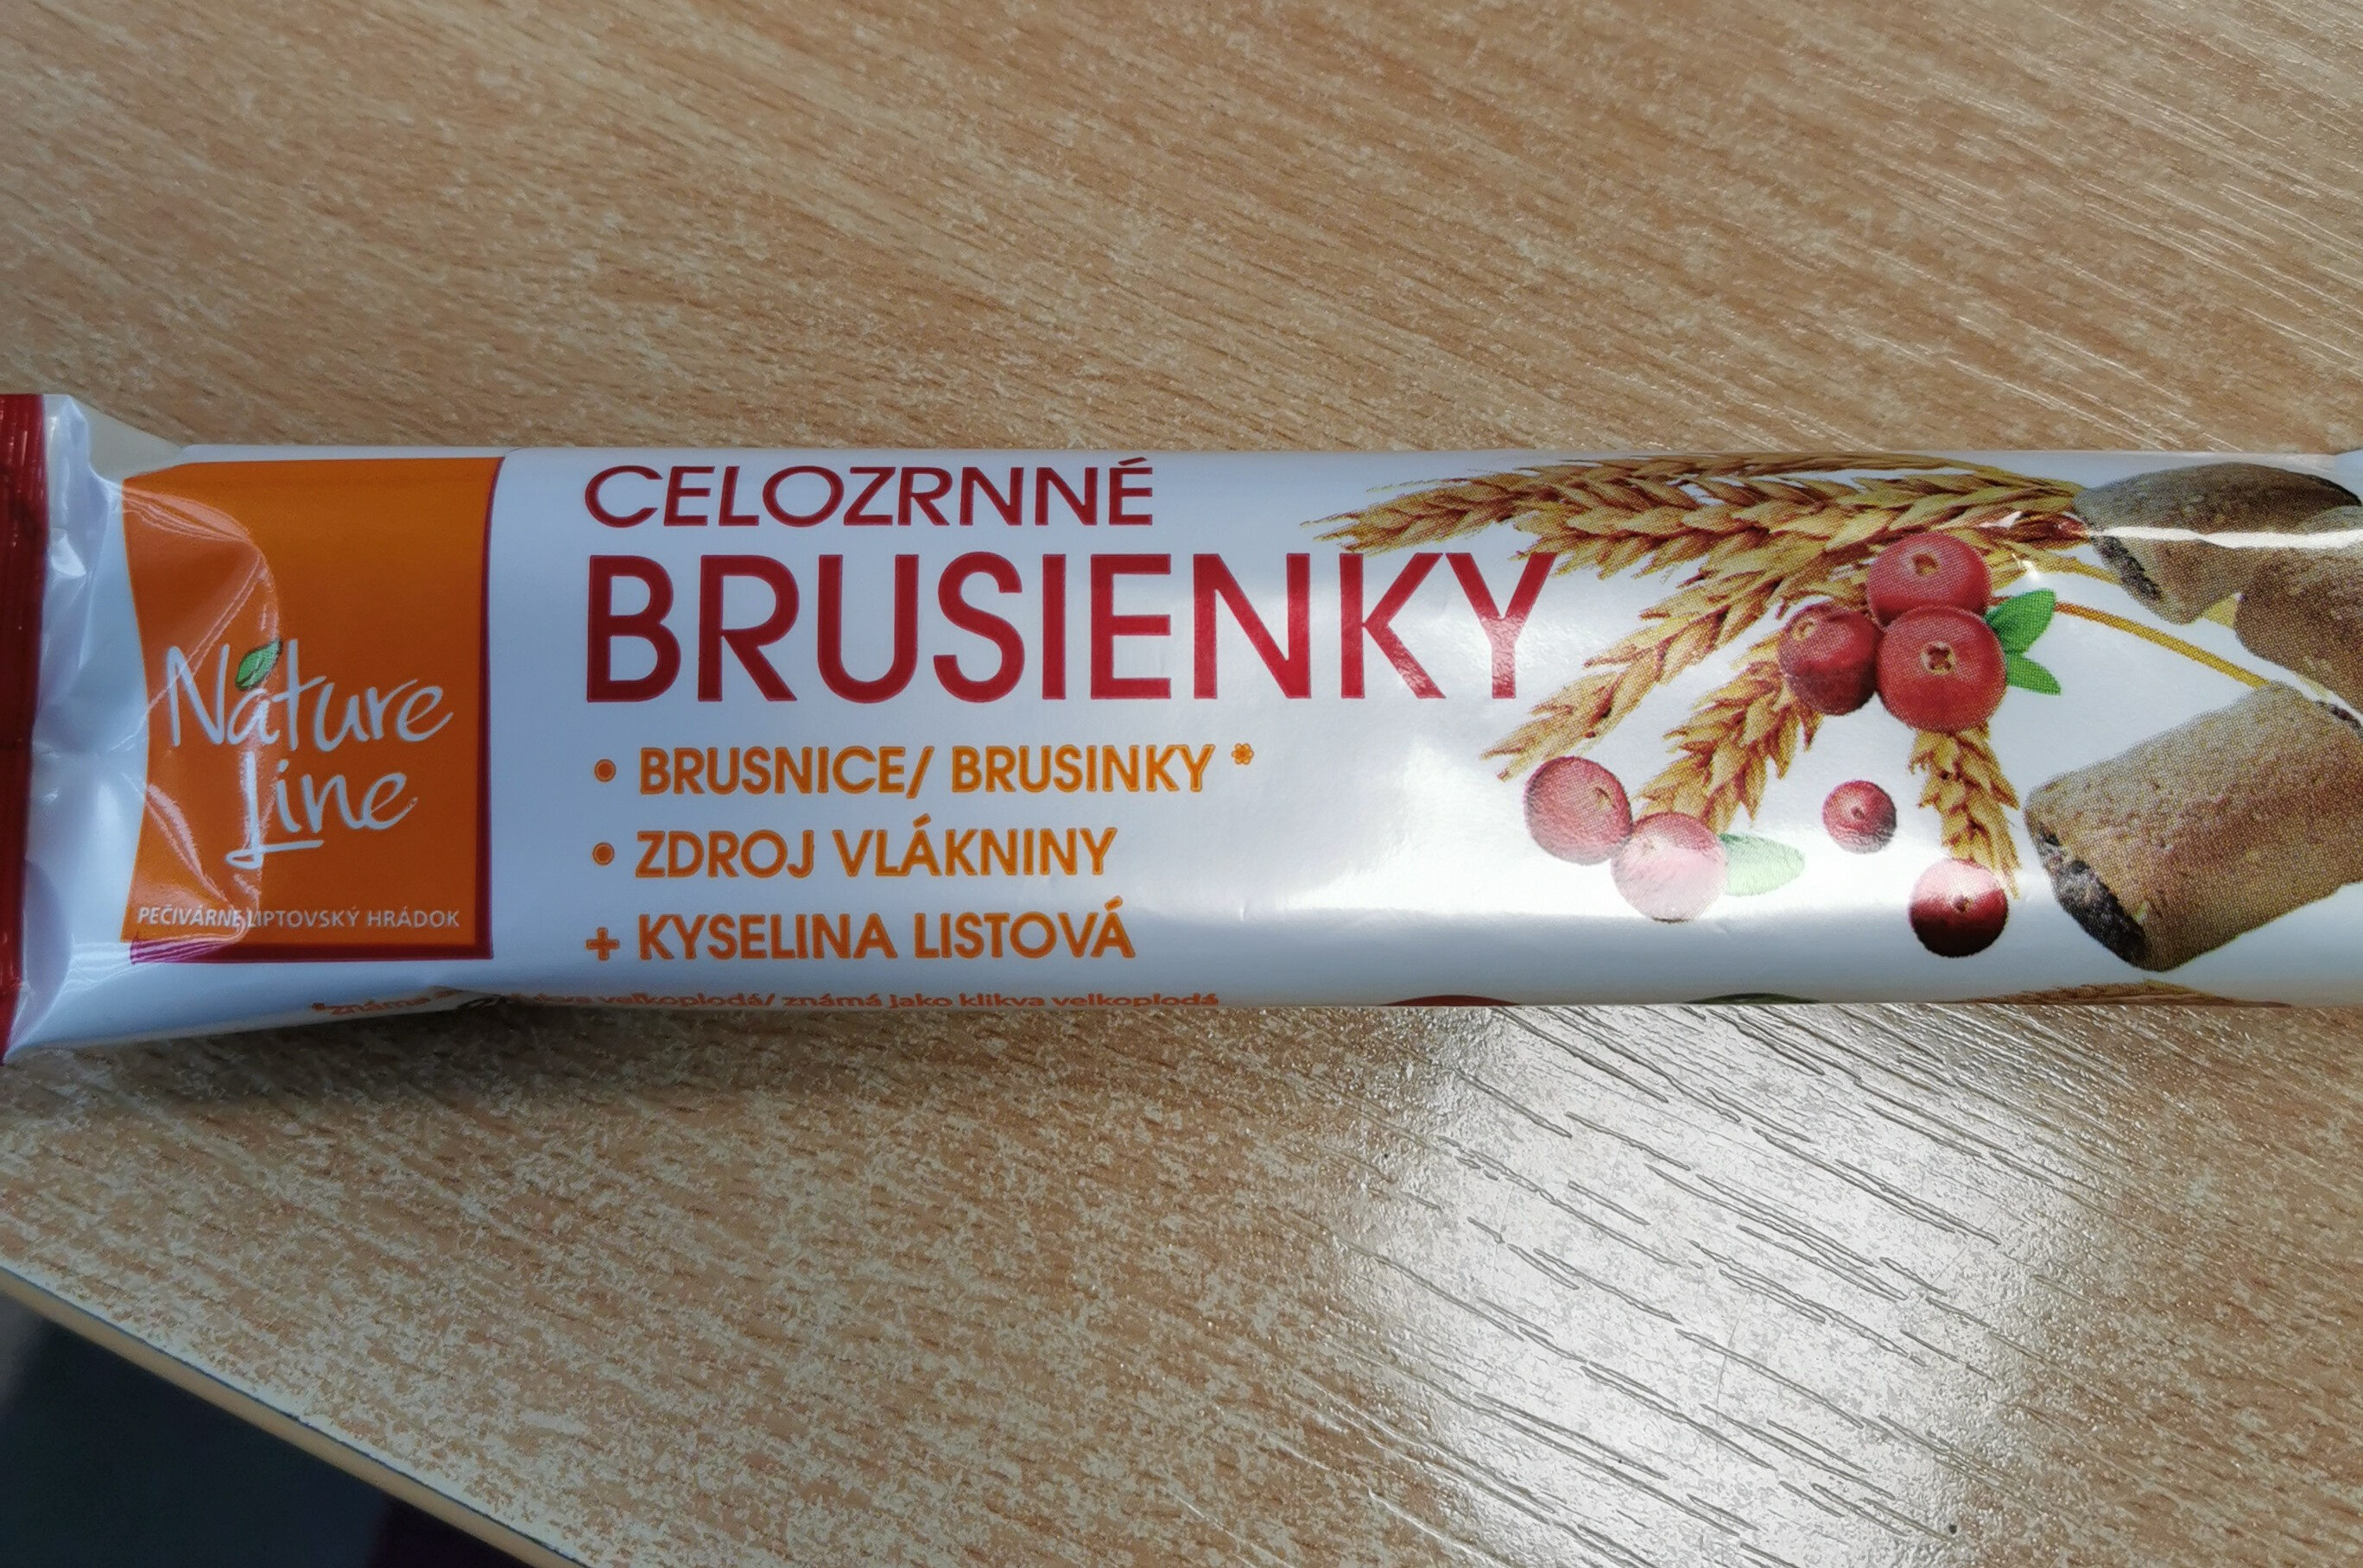 Celozrnné brusienky - Produit - sk